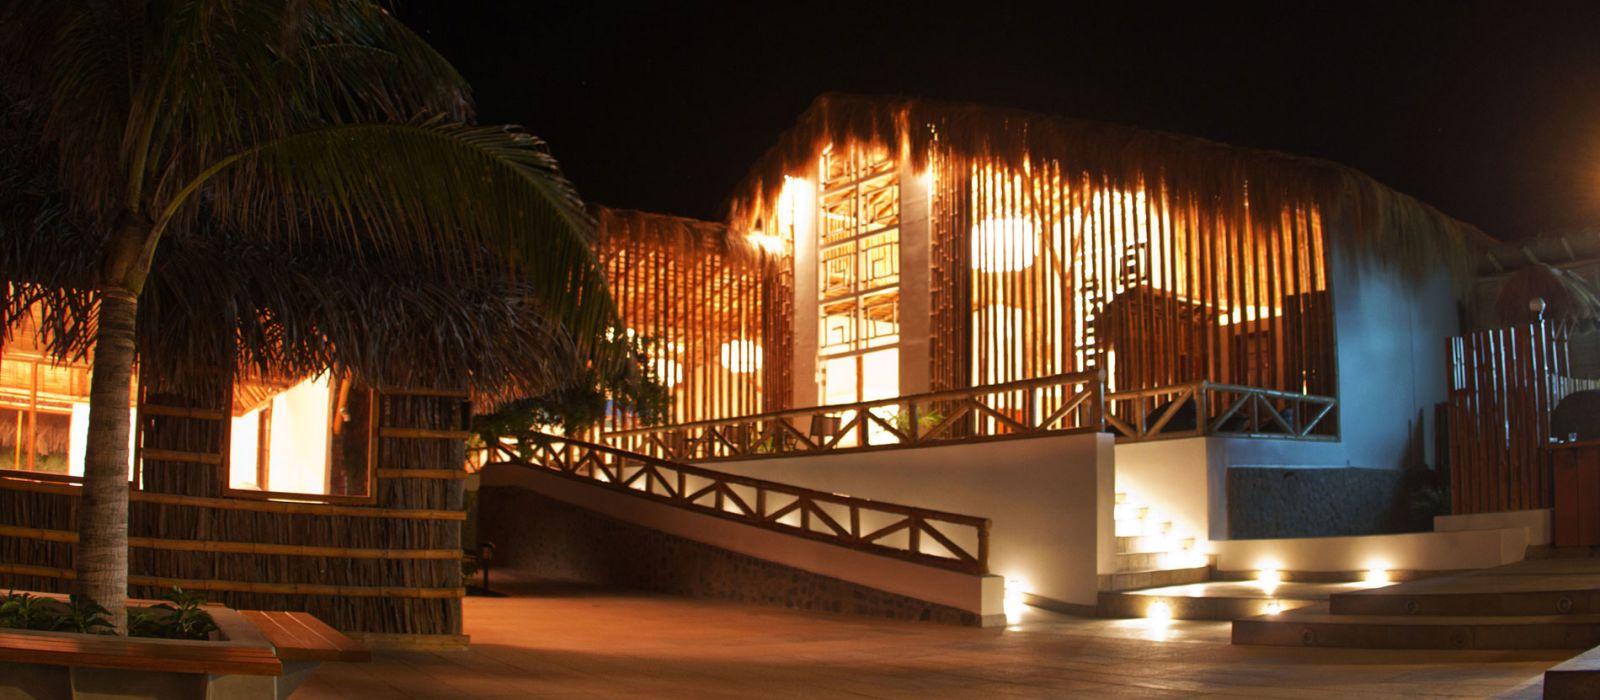 Hotel Aranwa Vichayito Peru